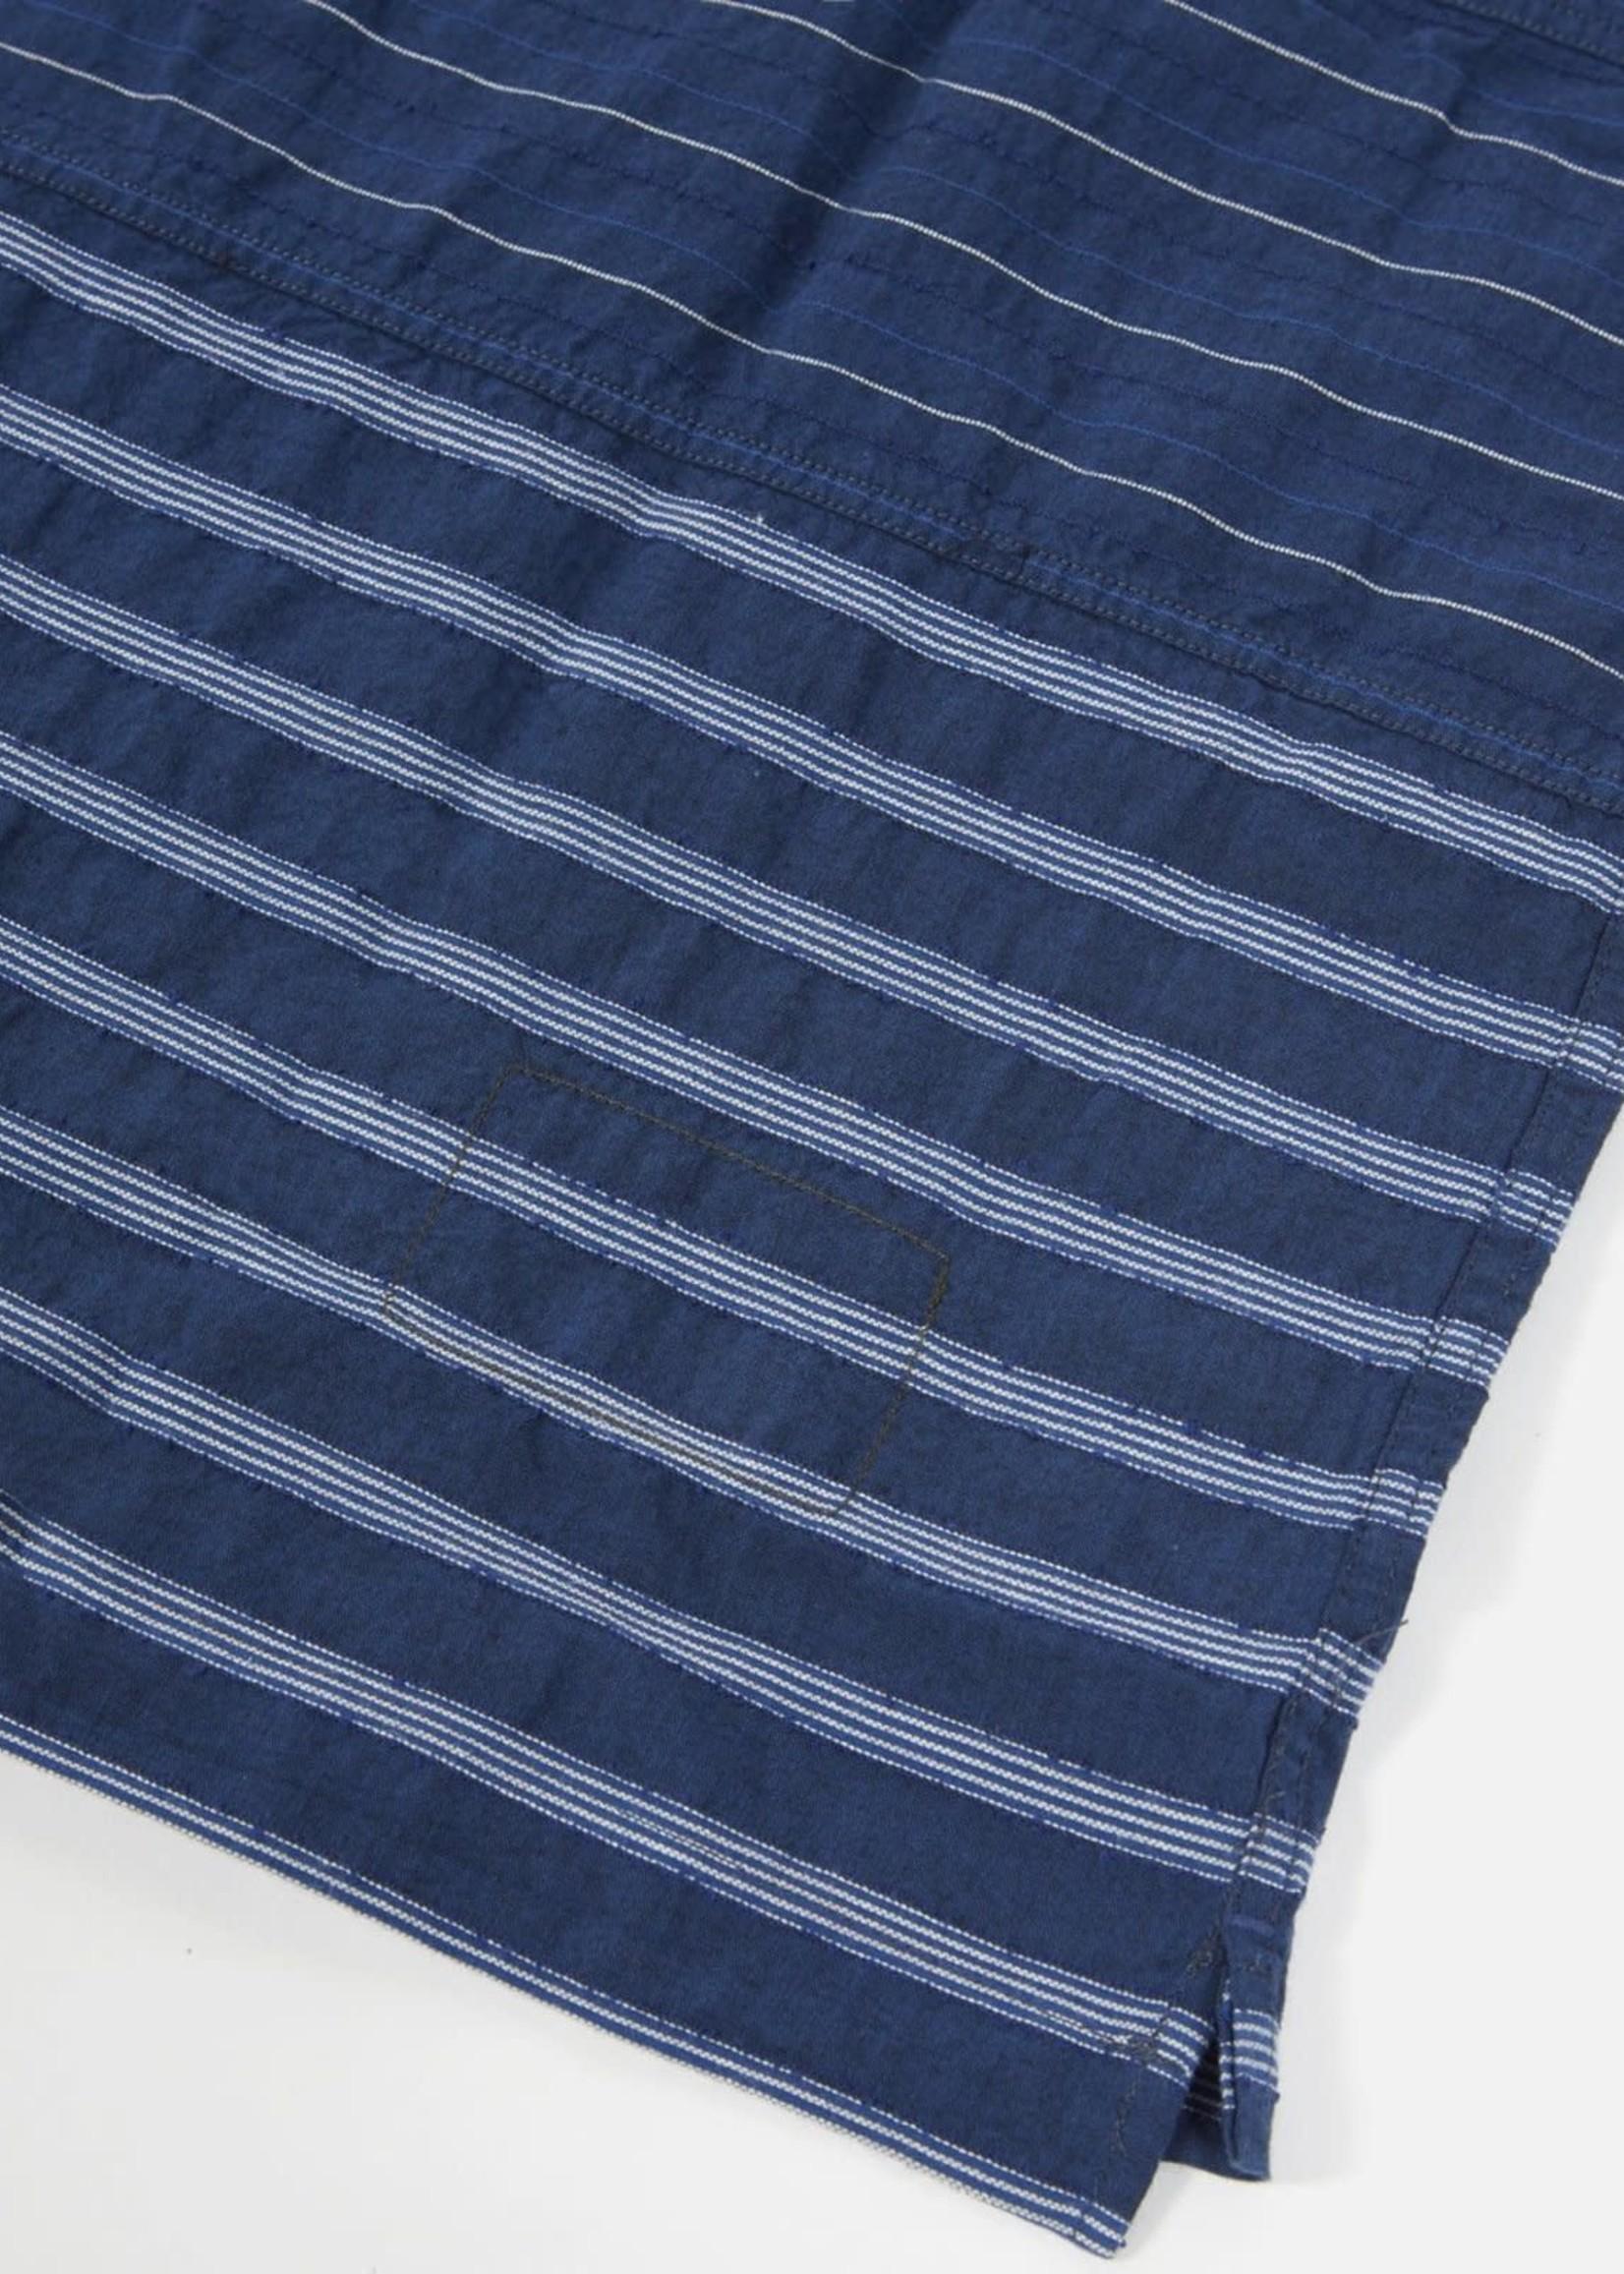 Universal Works Universal Works Panel Shirt Cotton/Poly Light Blue